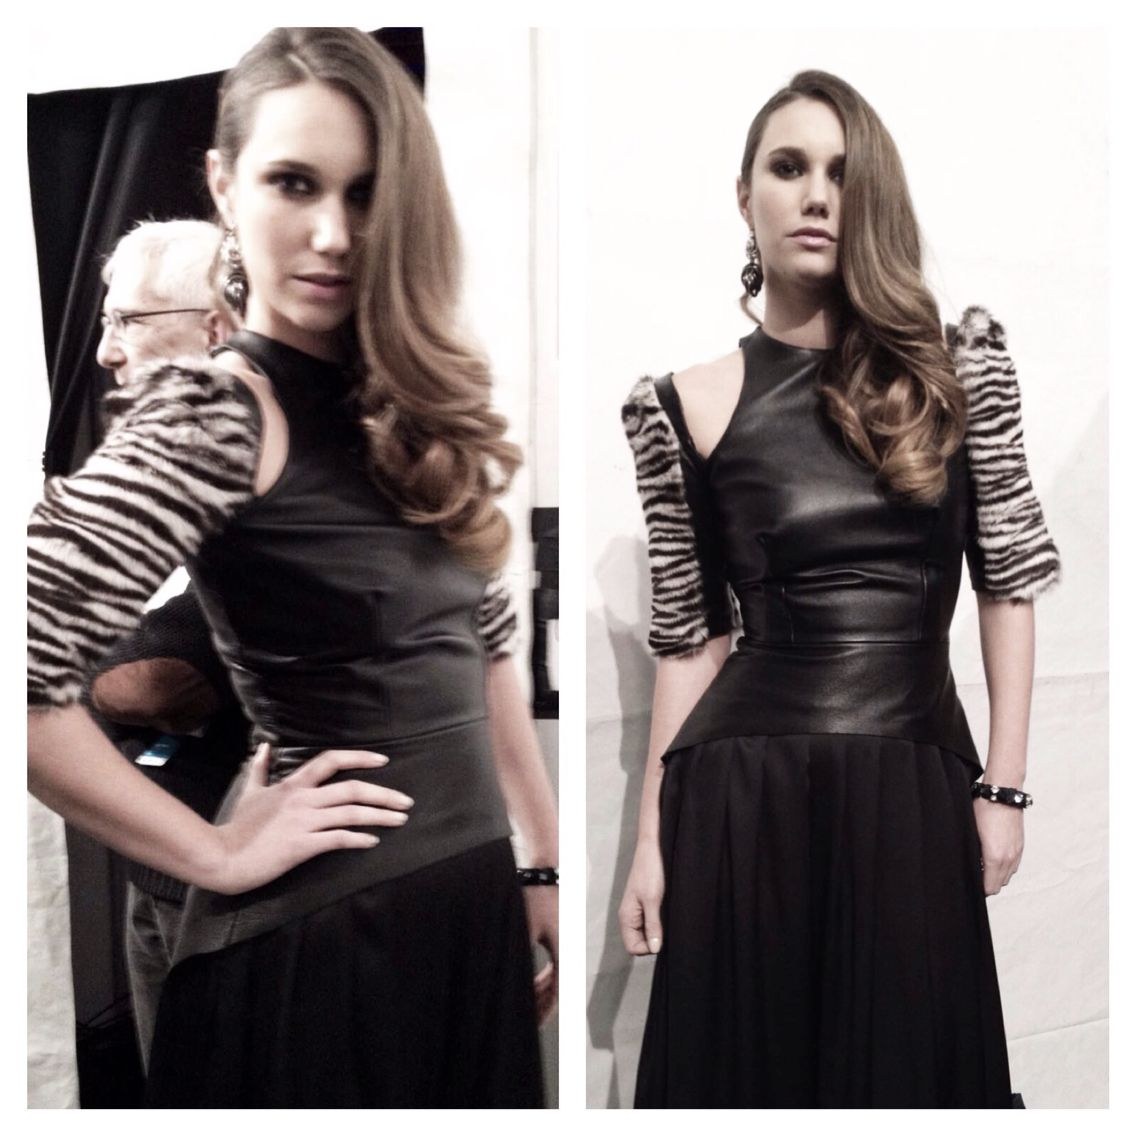 Genoveva Christoff design, leather dress, fur sleeves, zebra print, edgy long dress.